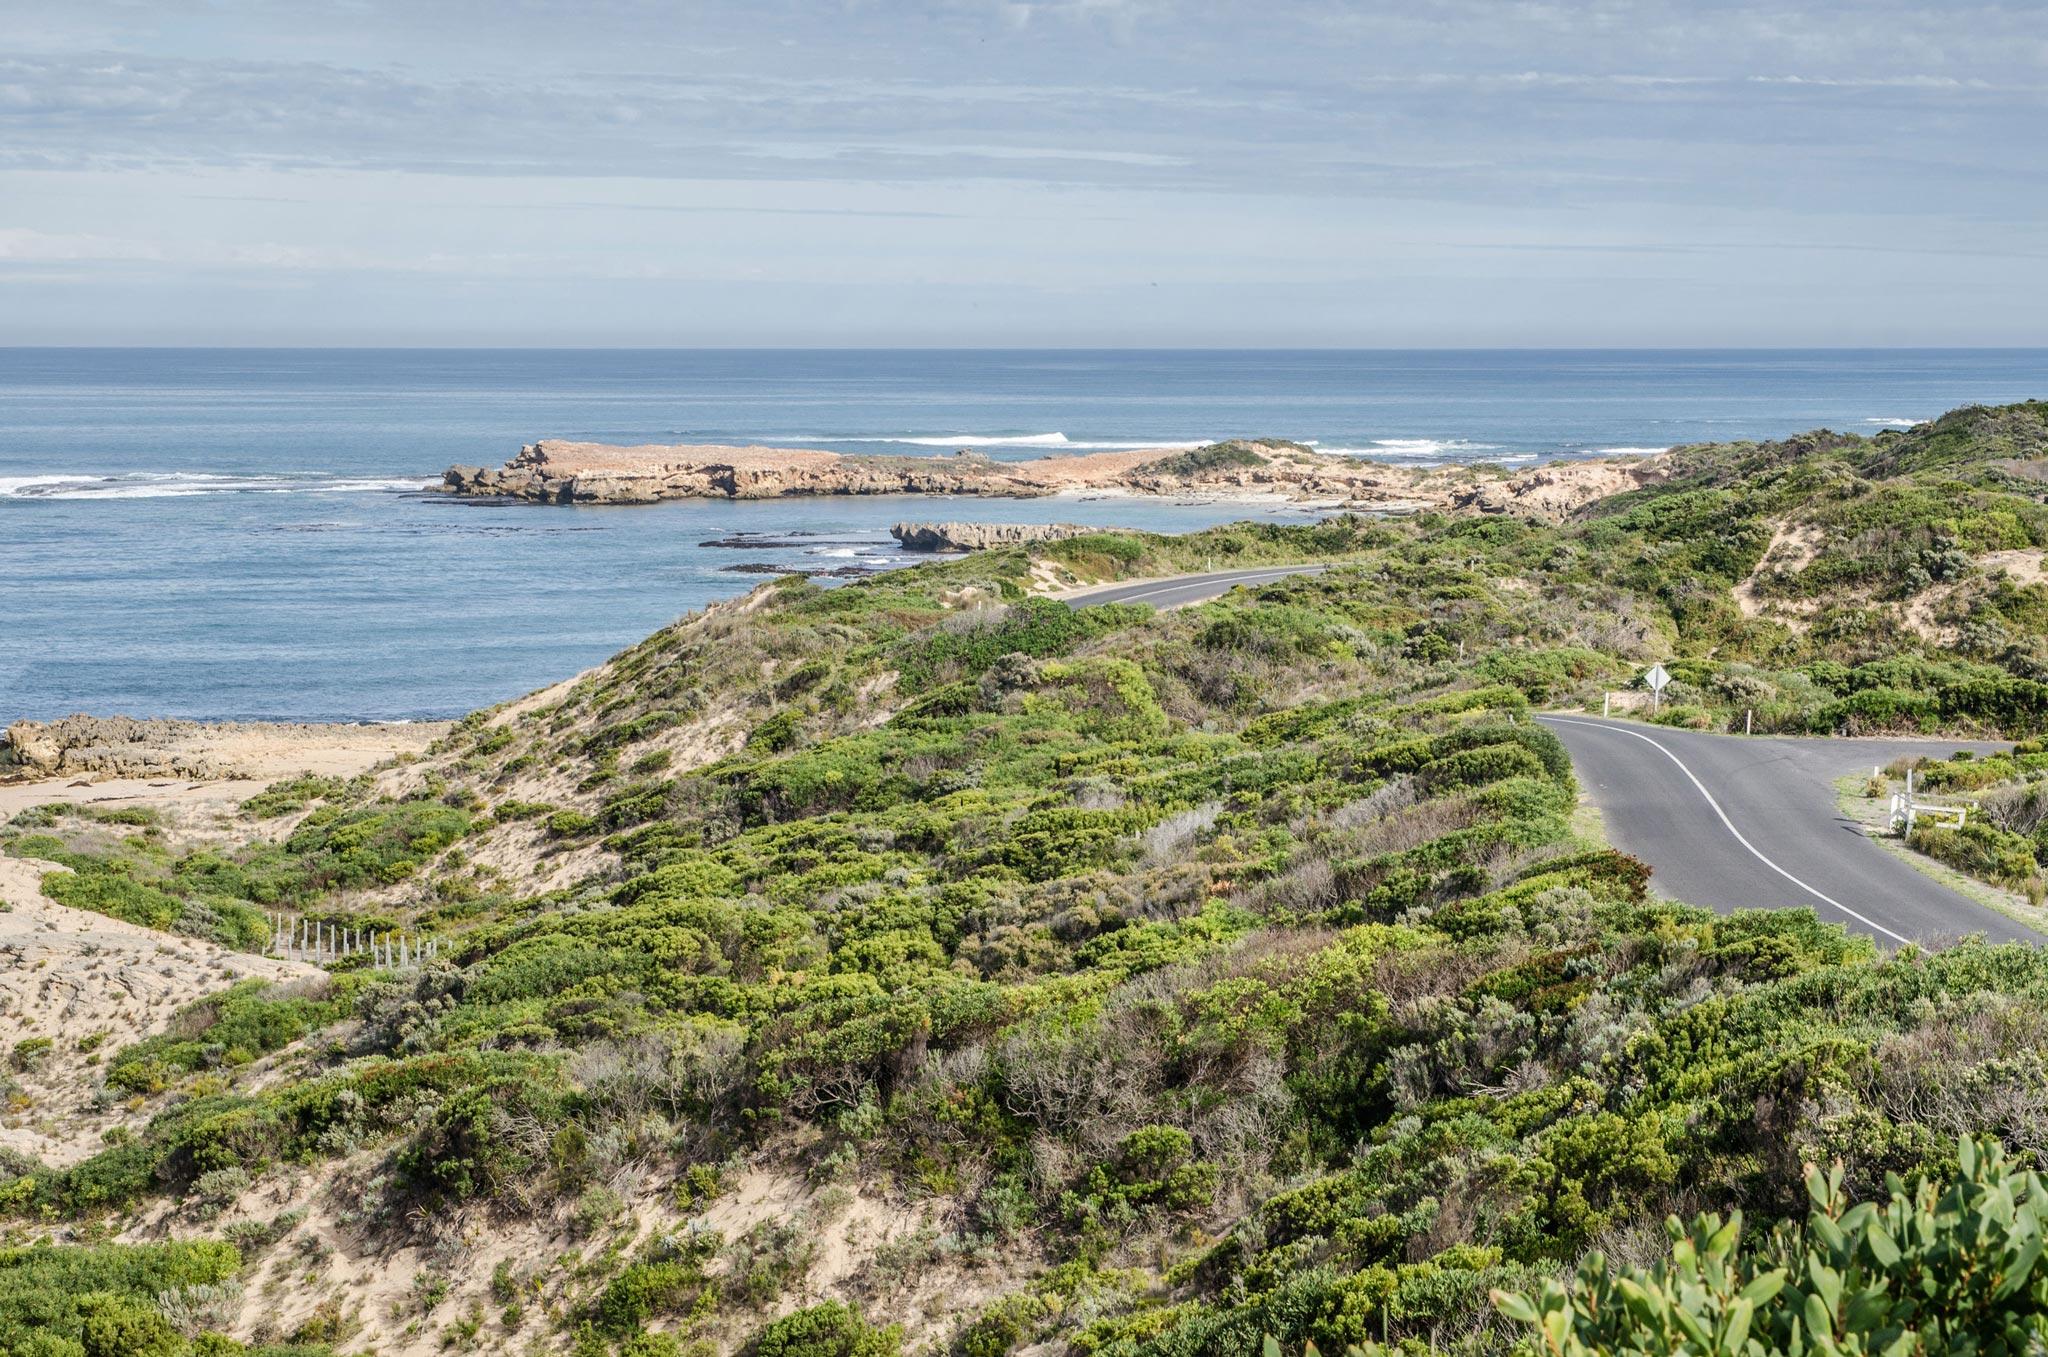 Paesaggi-Australia - DSC 5432 - Fotografo di paesaggi Australia - Fotografo di paesaggi Australia